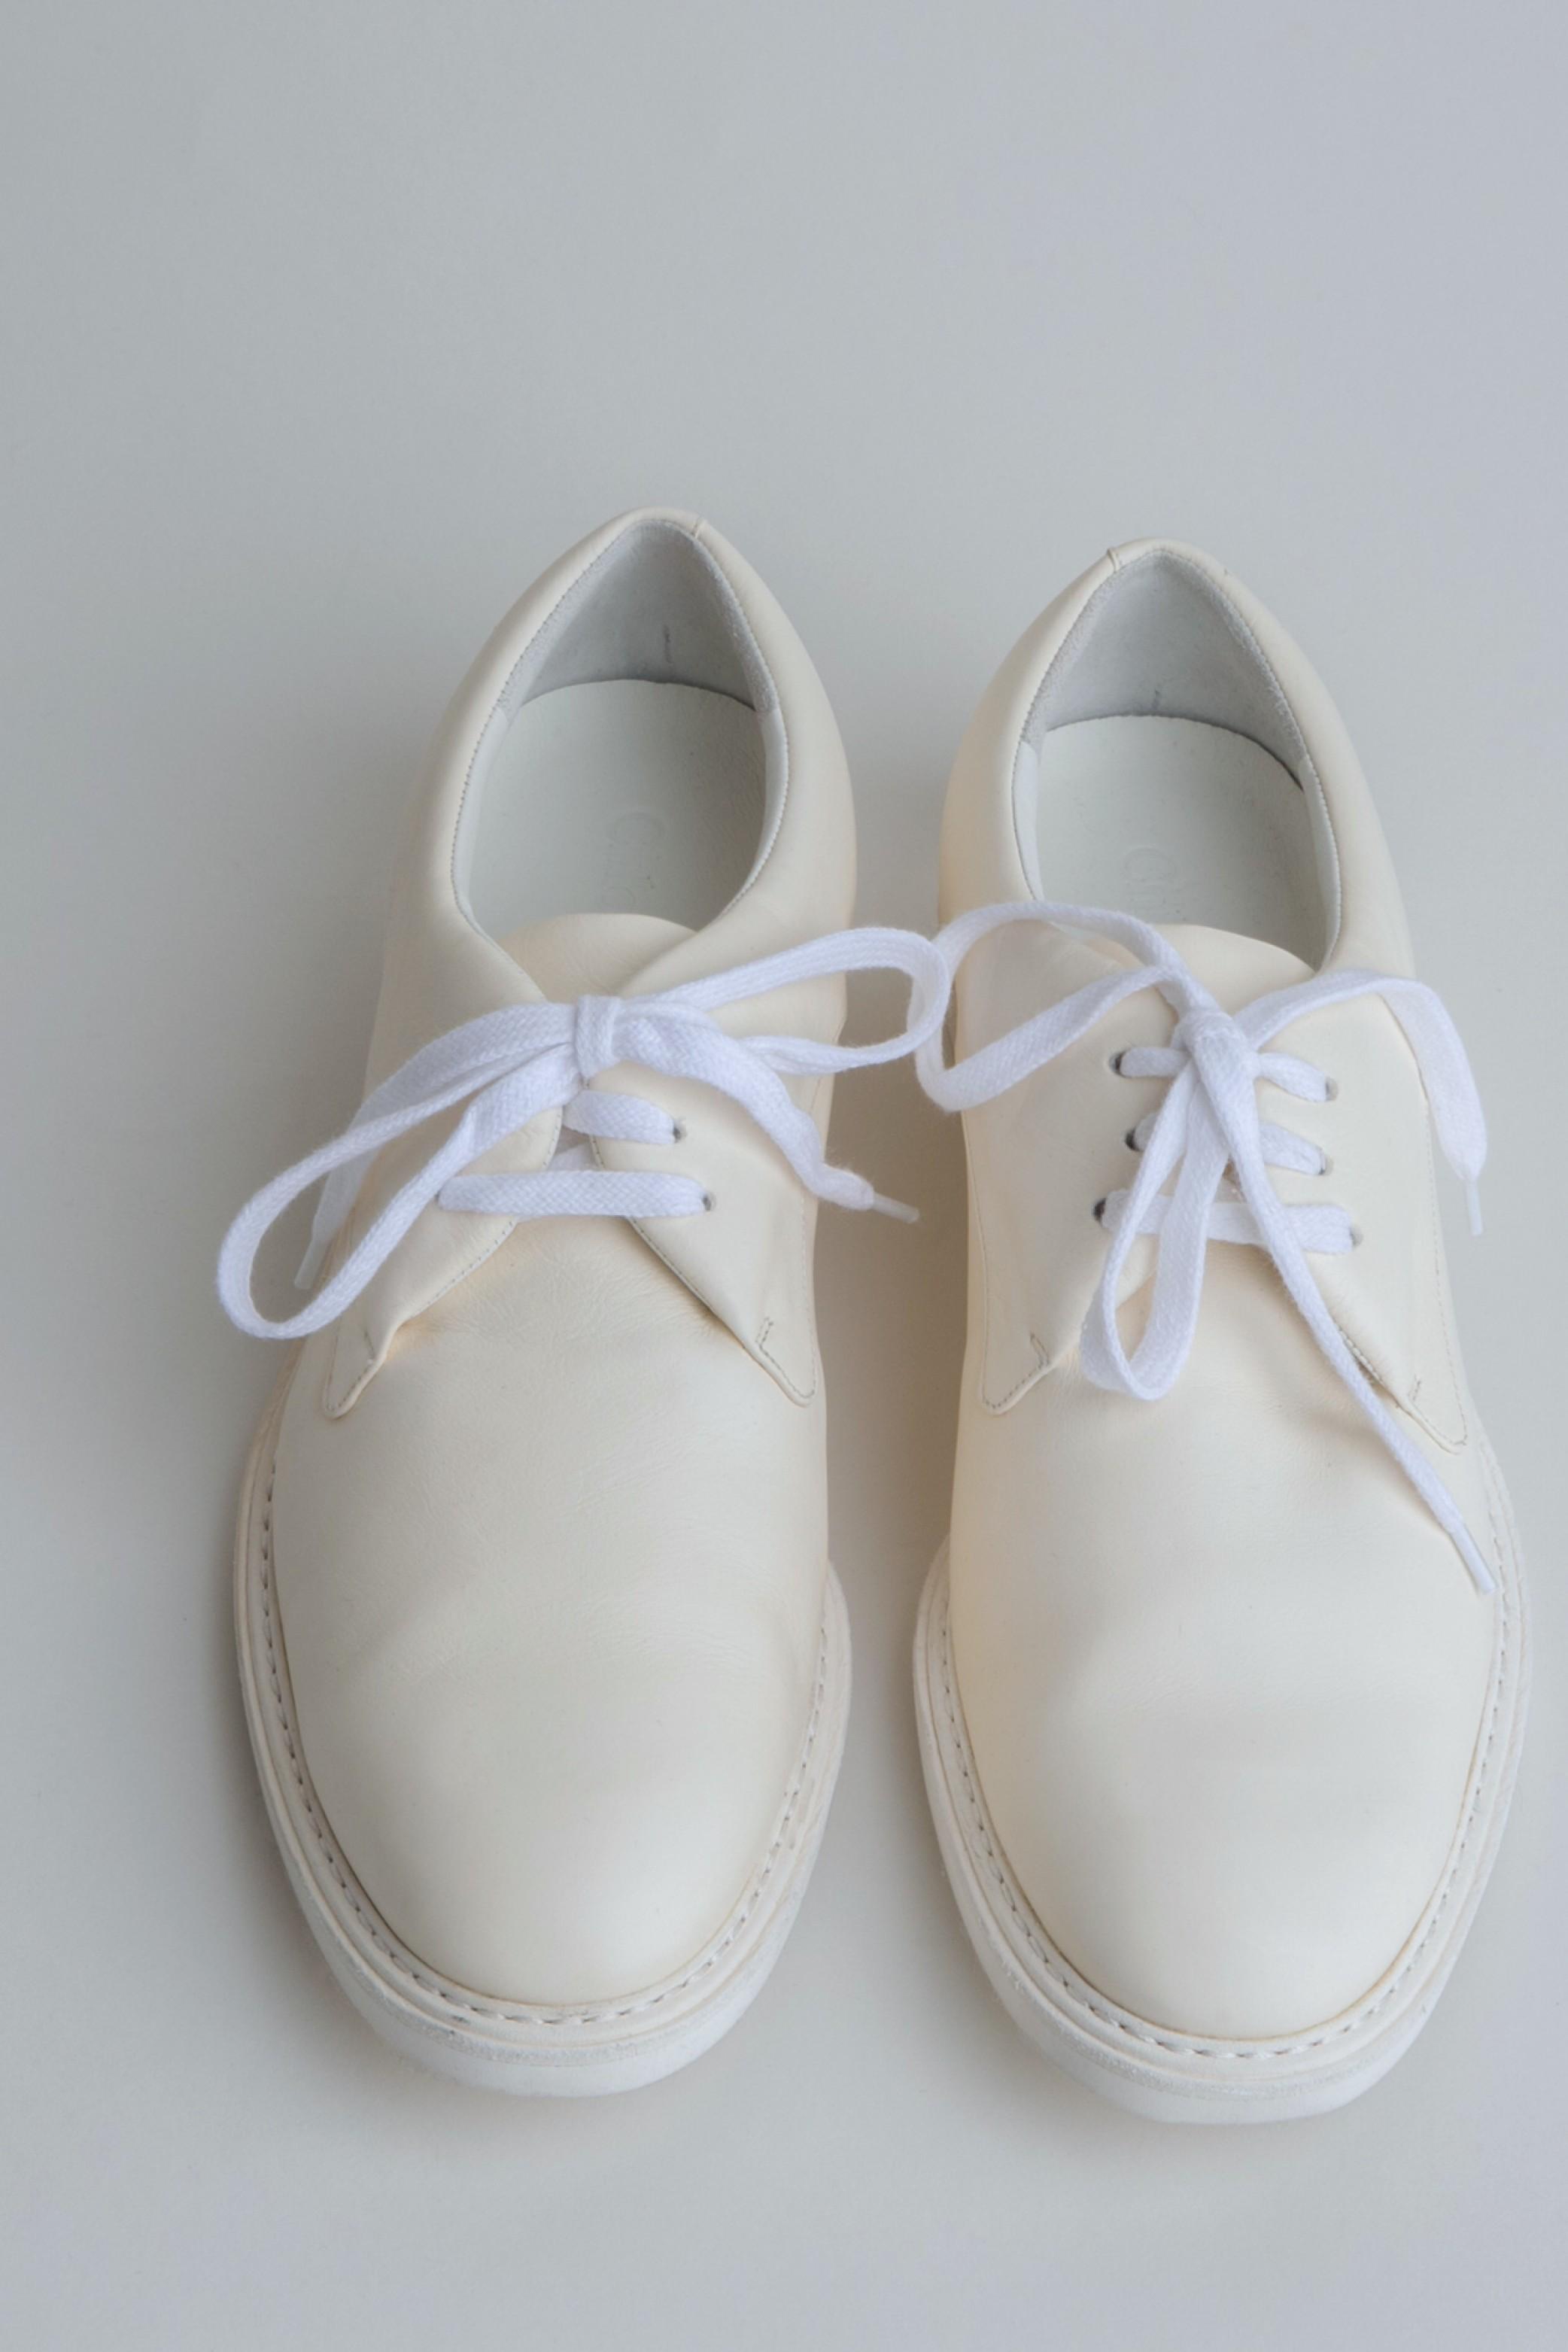 Chloe Derby Shoes